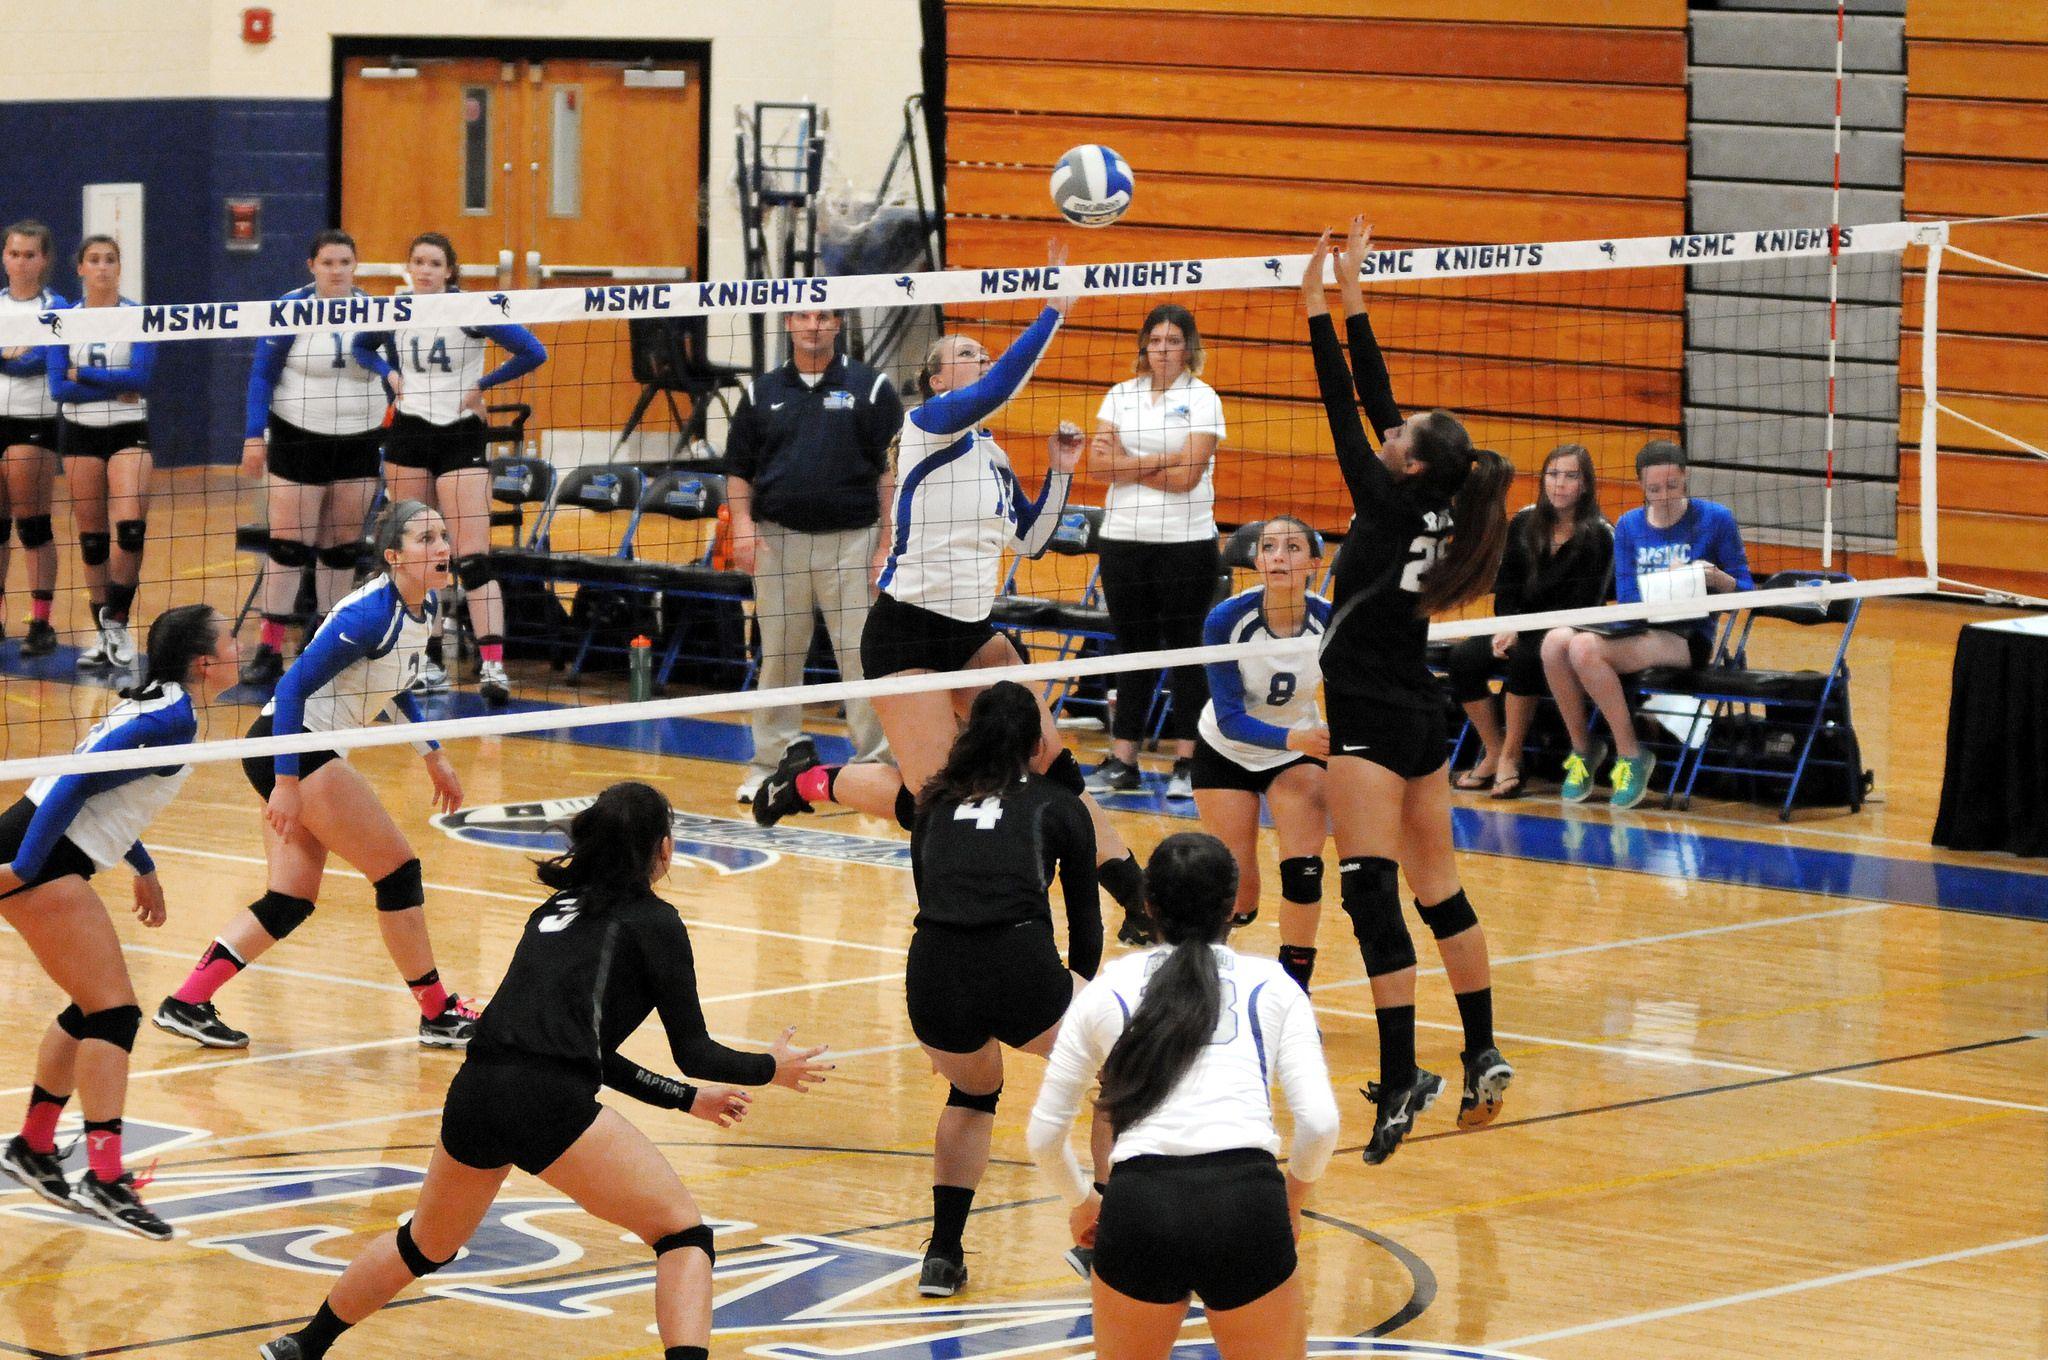 Lf Volleyball 9024 Volleyball Volleyball Team Bard College